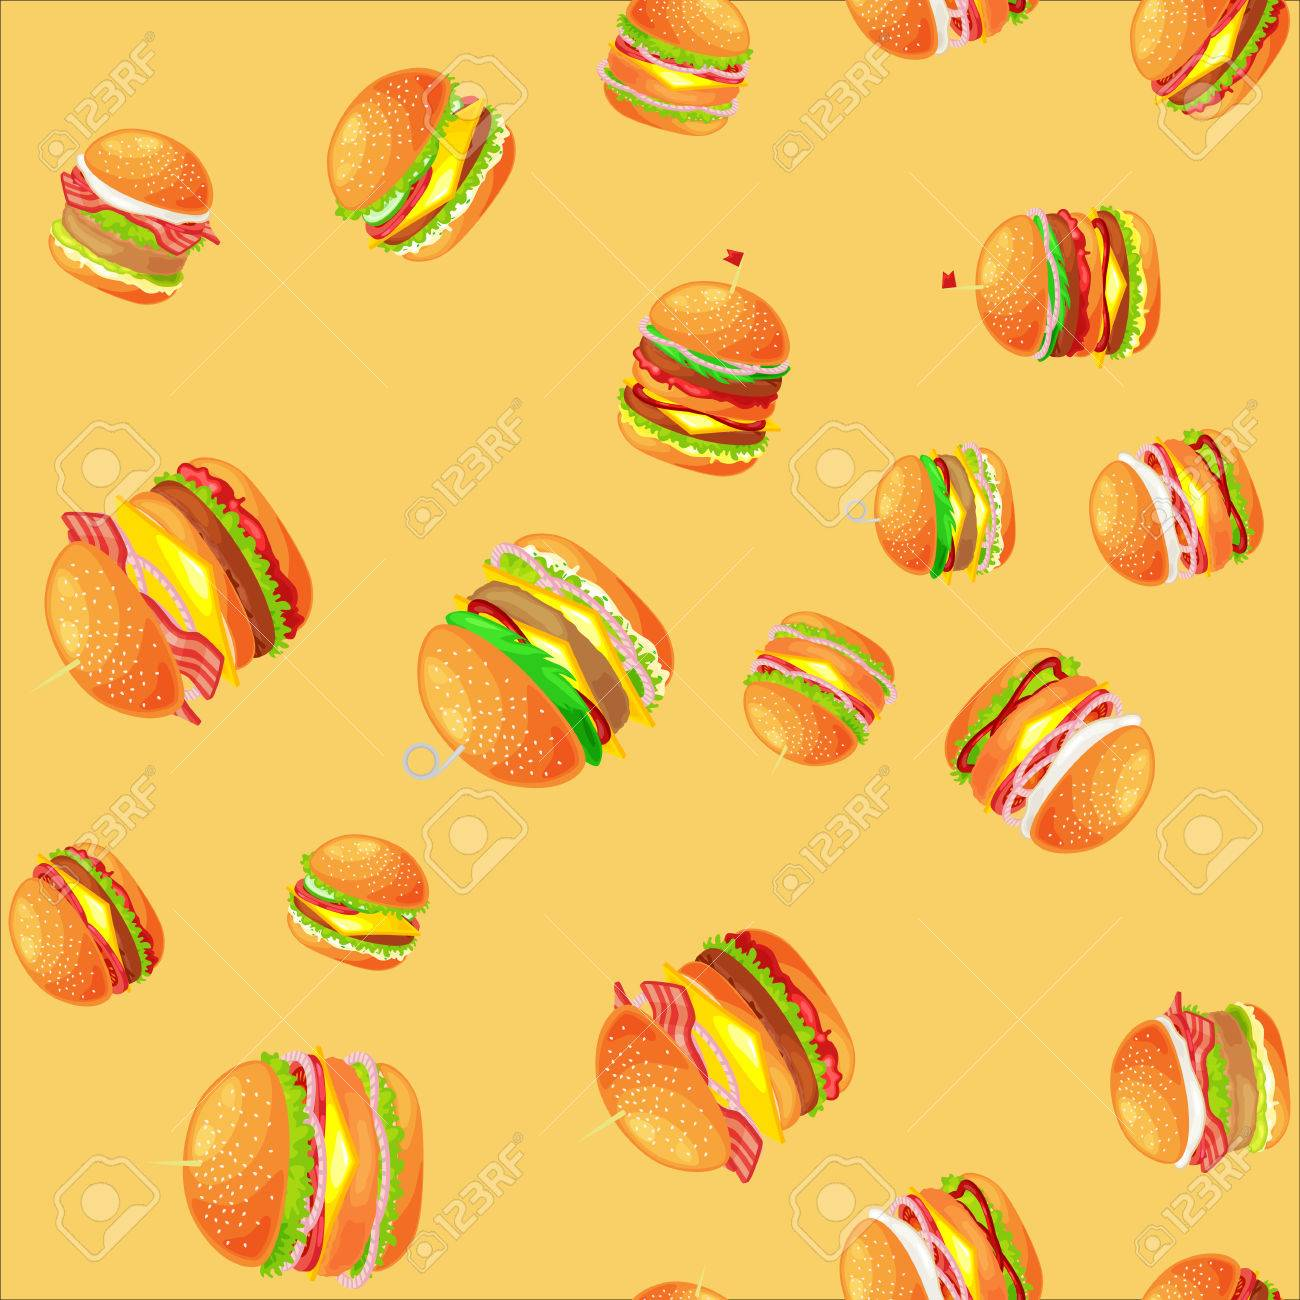 american hamburger fast food meal menu vector illustration